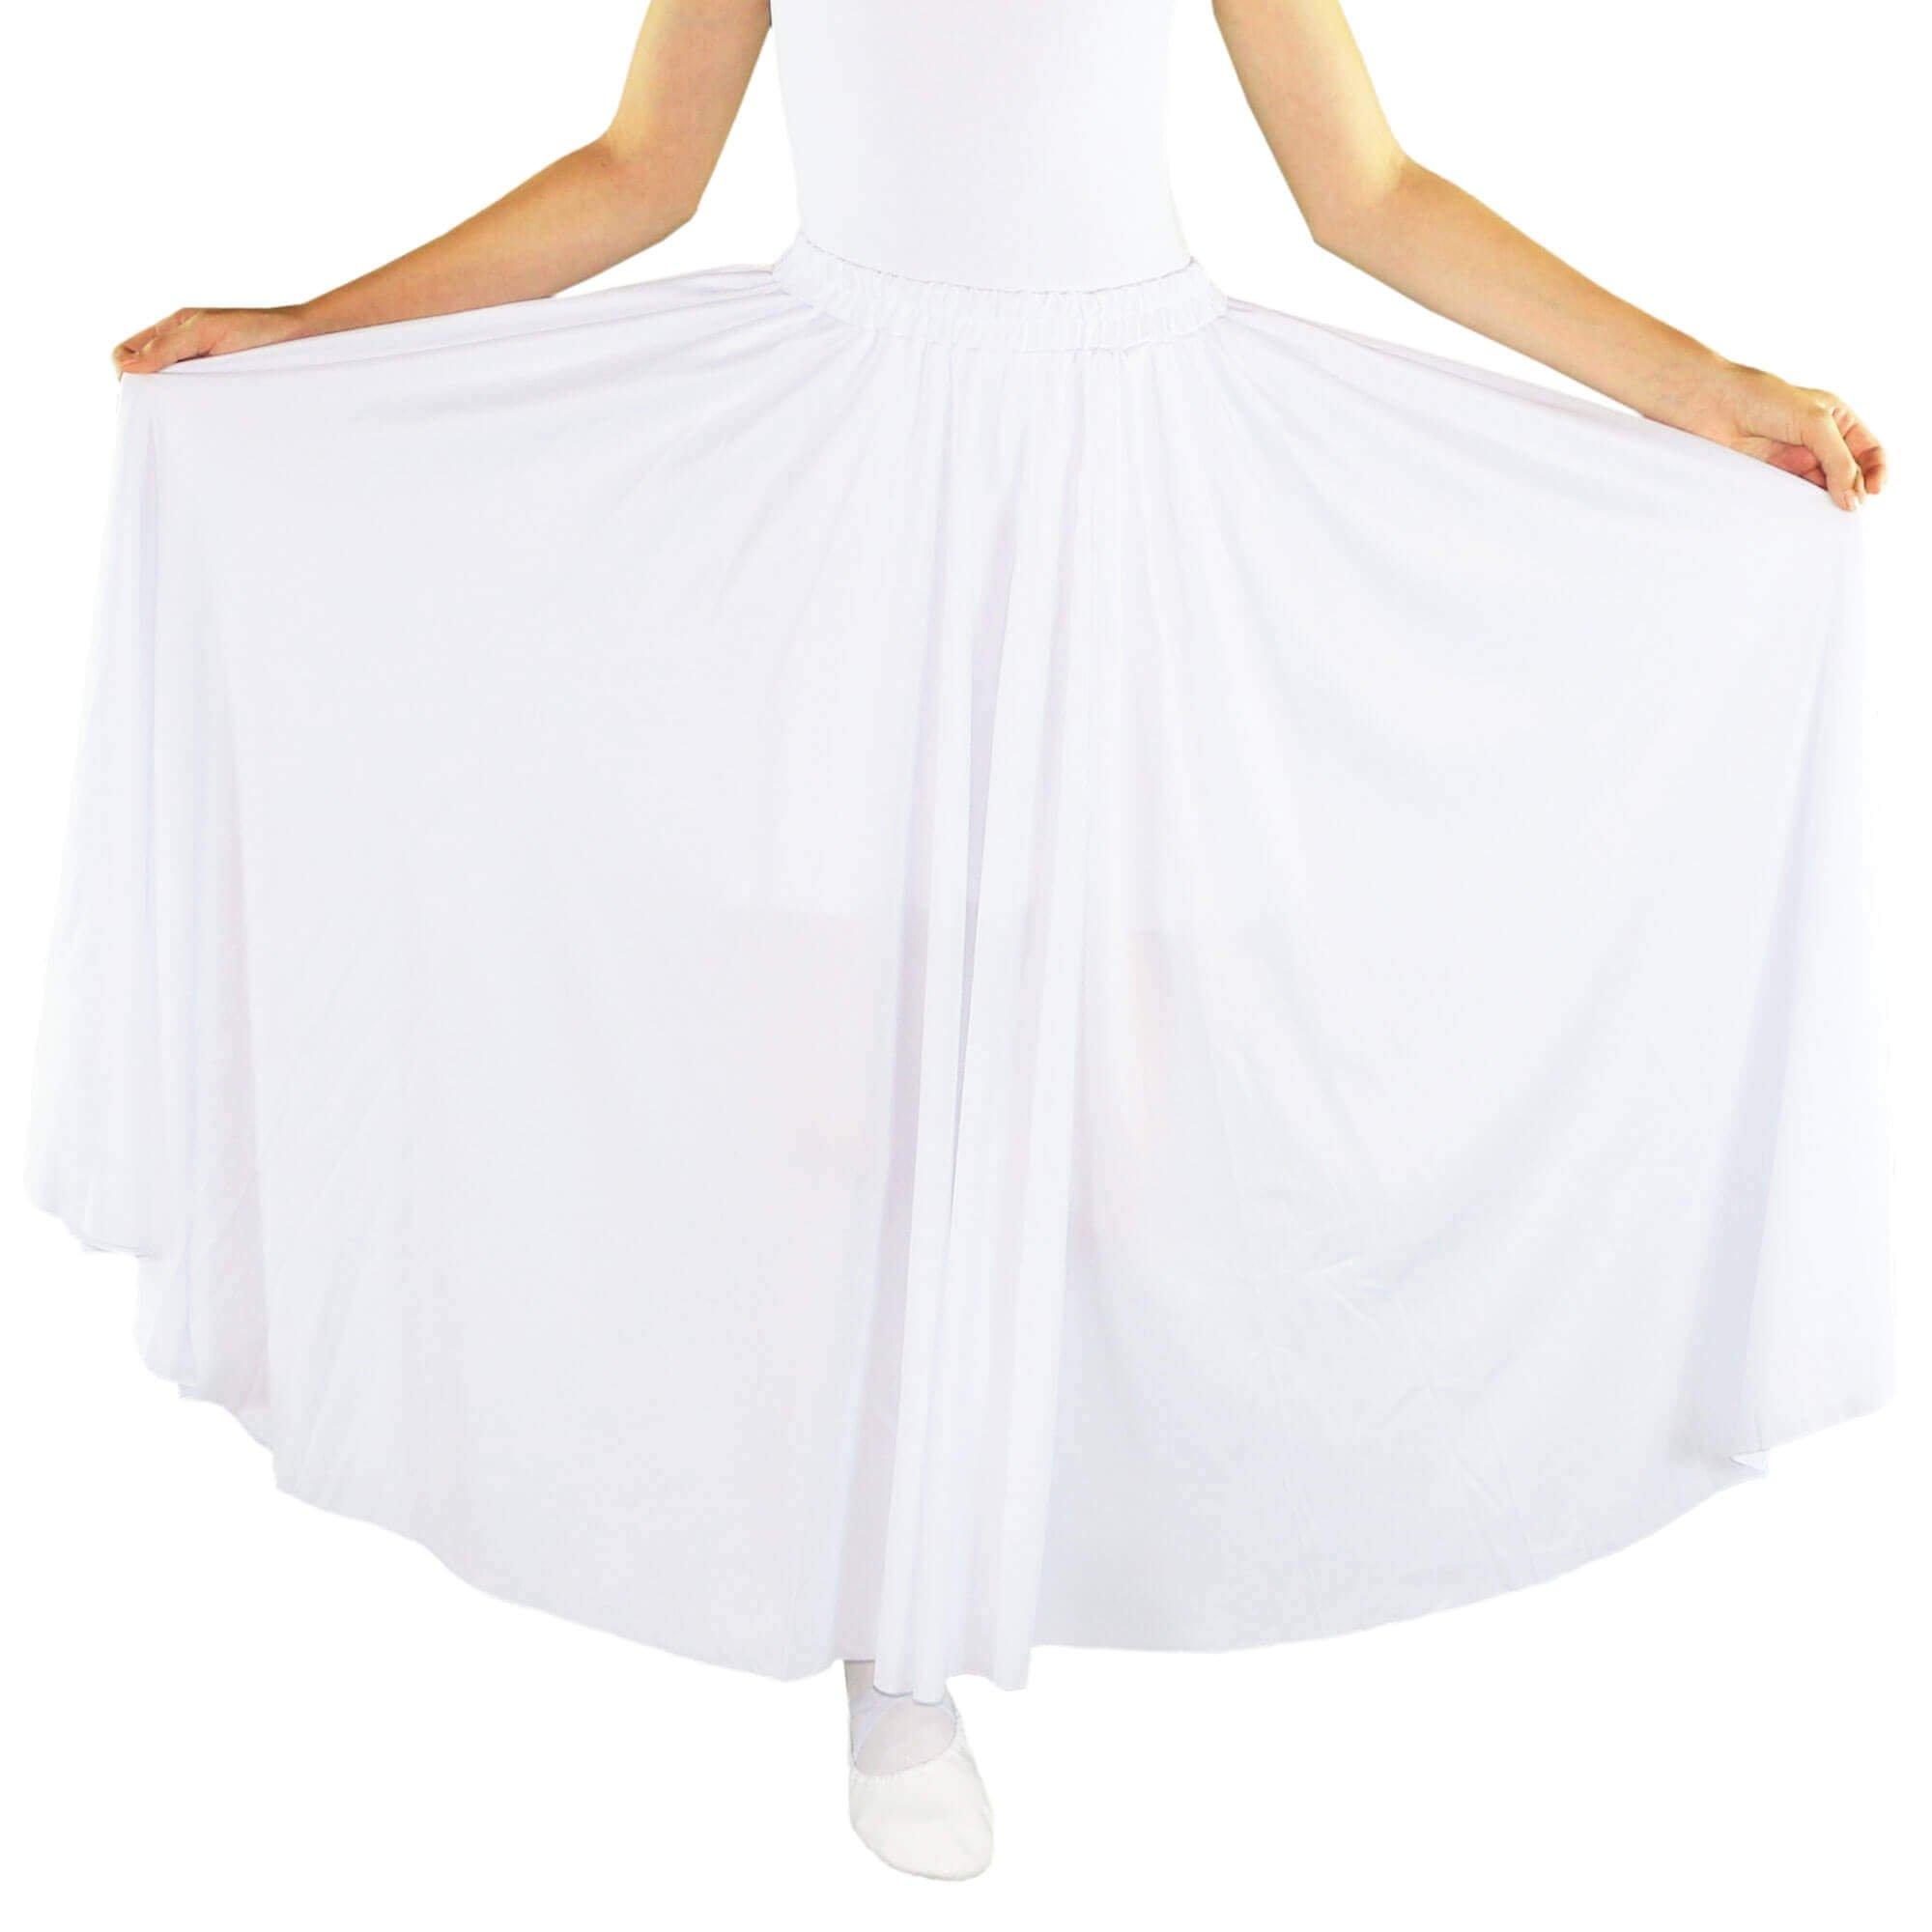 Danzcue Girls Long Full Circle Dance Skirt, White, L-XL by Danzcue